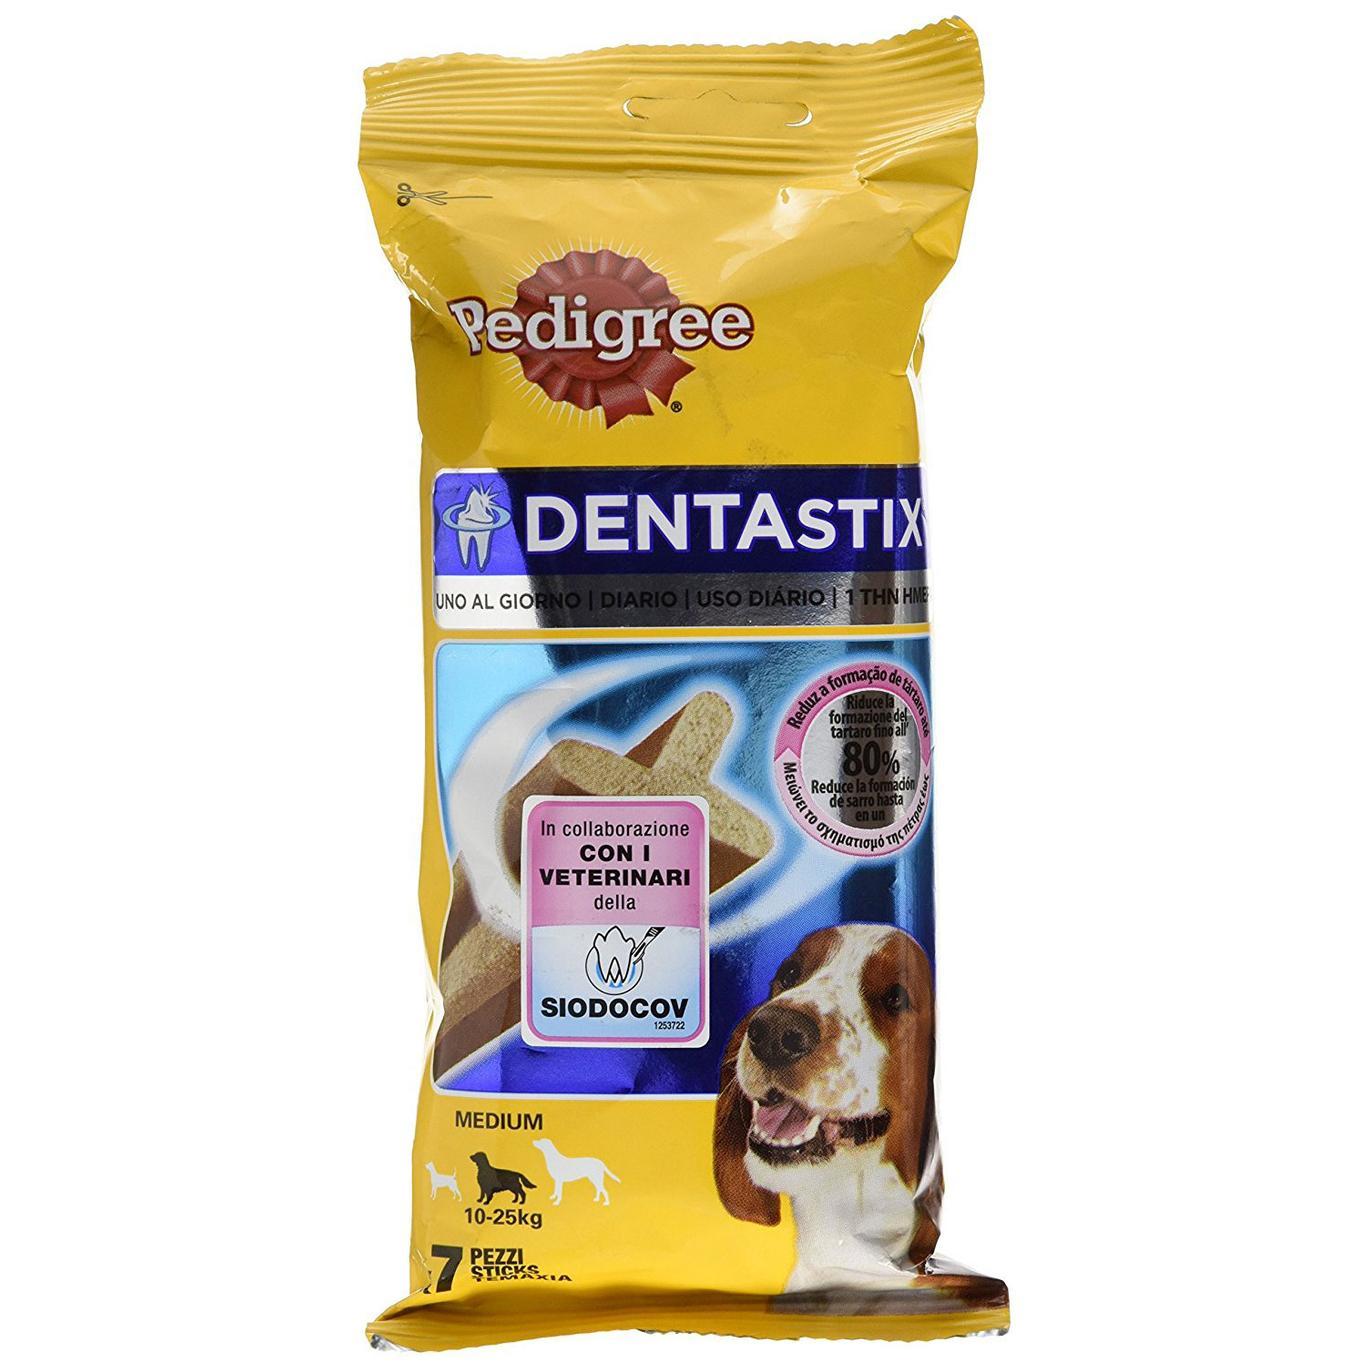 Pedigree Dentastix Uno al Giorno Medium 10-25 kg - 7 Pezzi da 180 gr